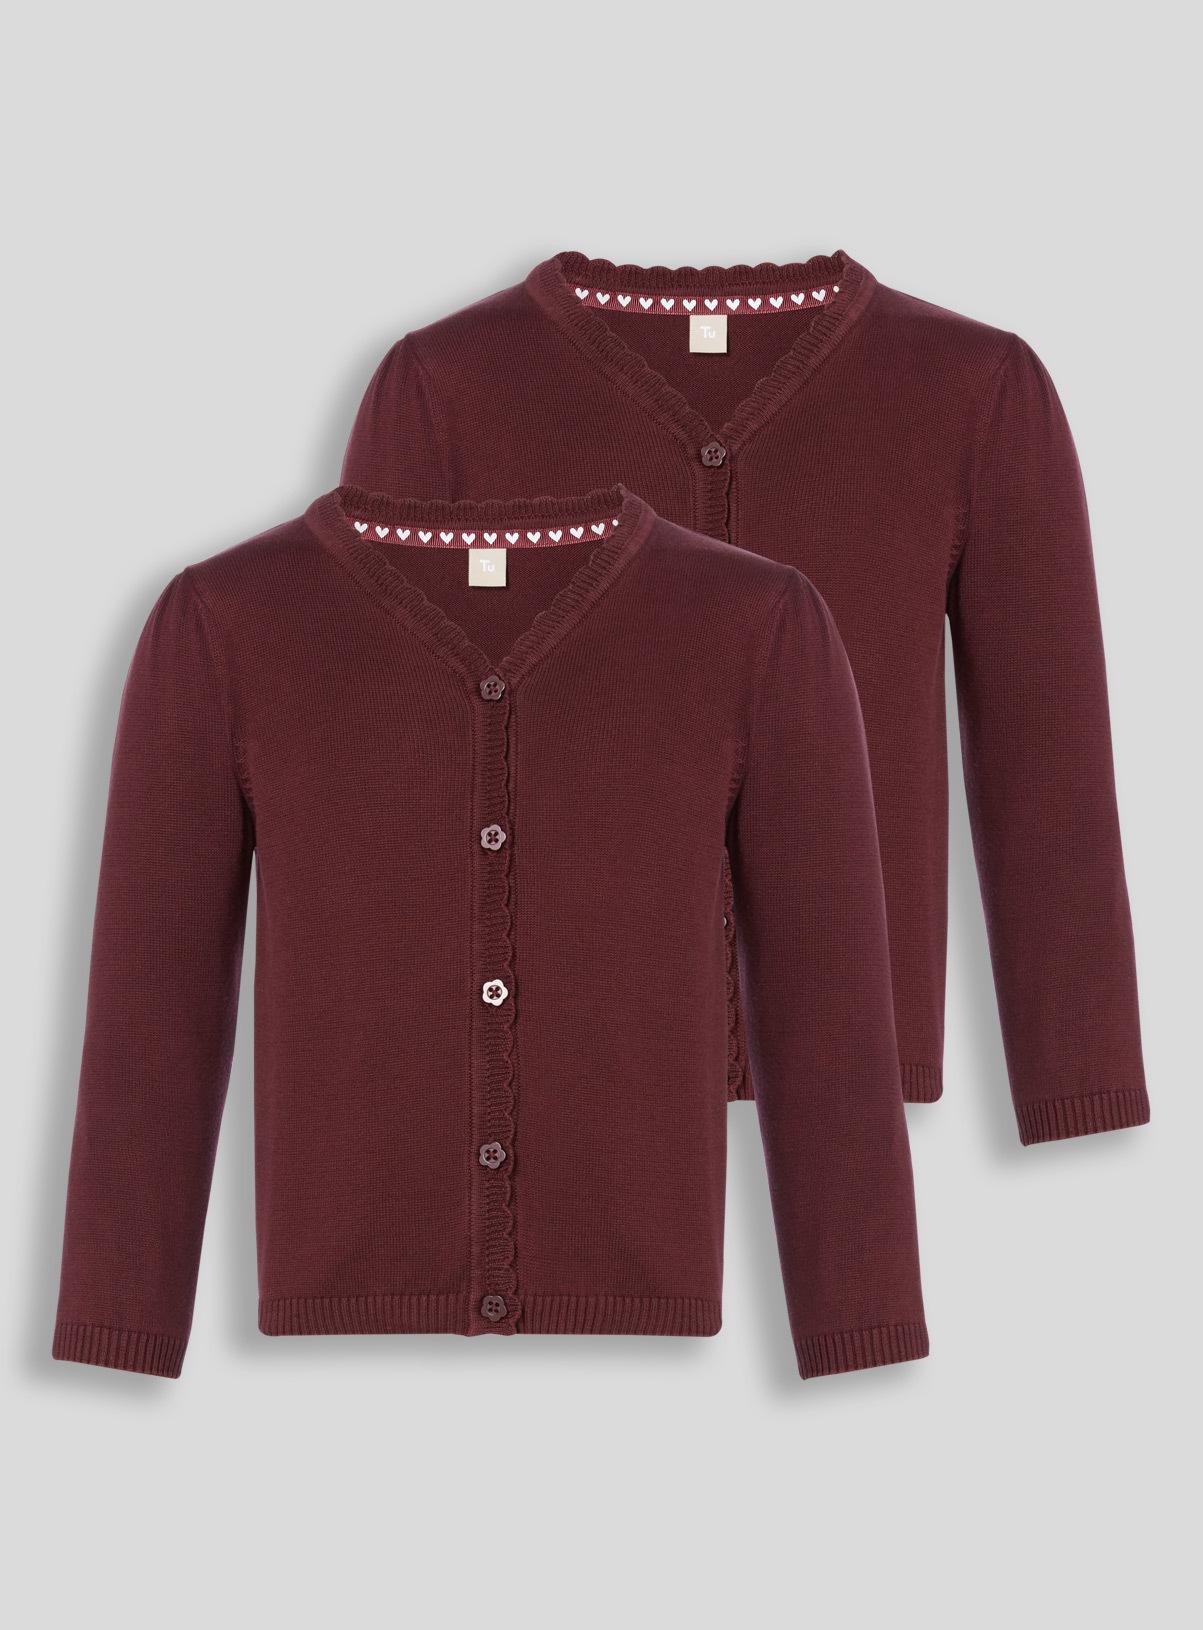 All Girl's Clothing Dark Red Cardigan 2 Pack (2-12 years) | Tu ...